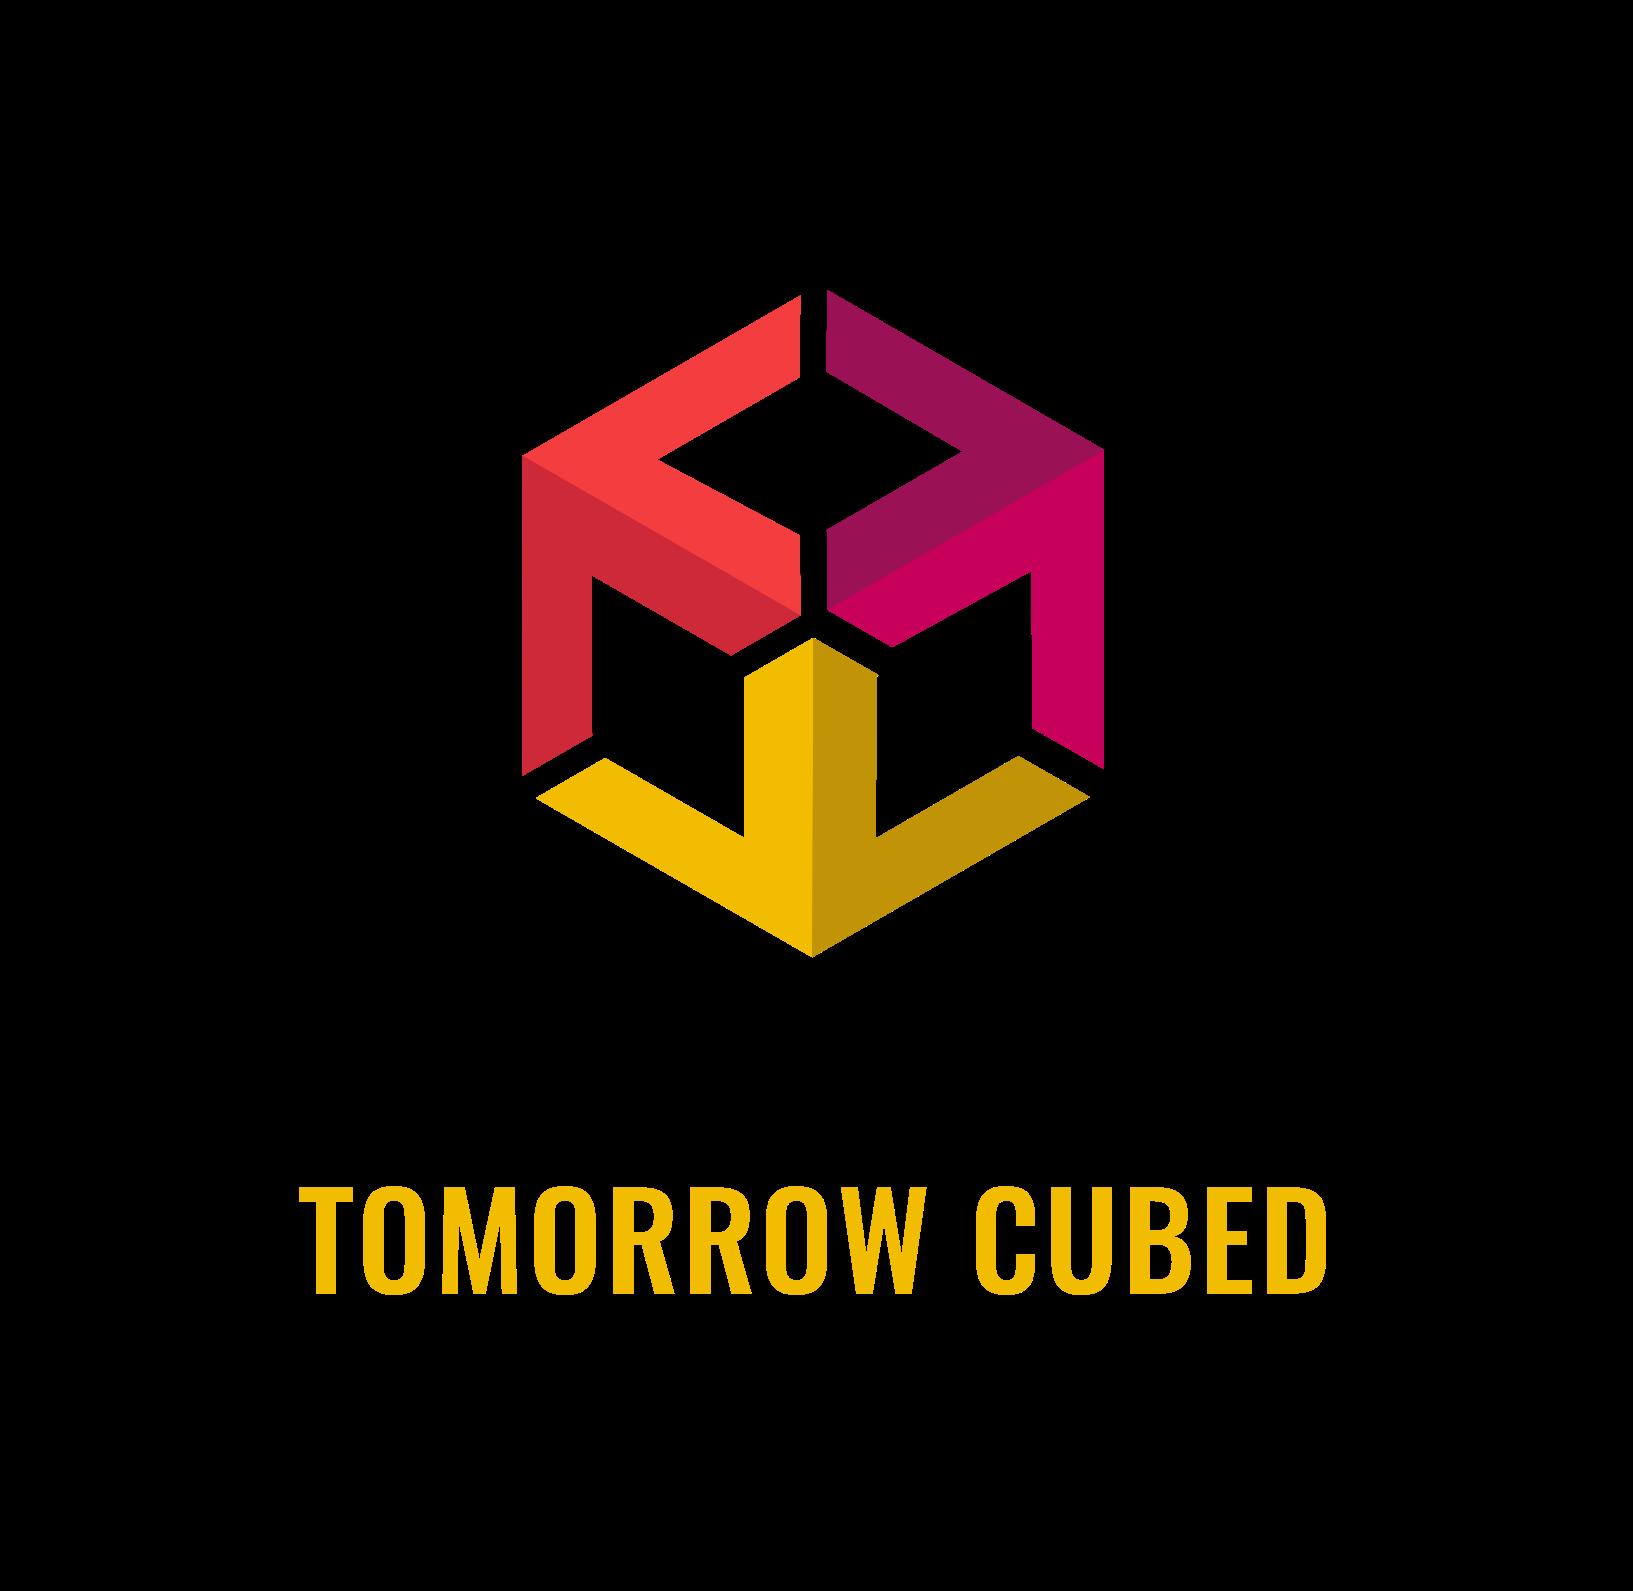 TomorrowCubed